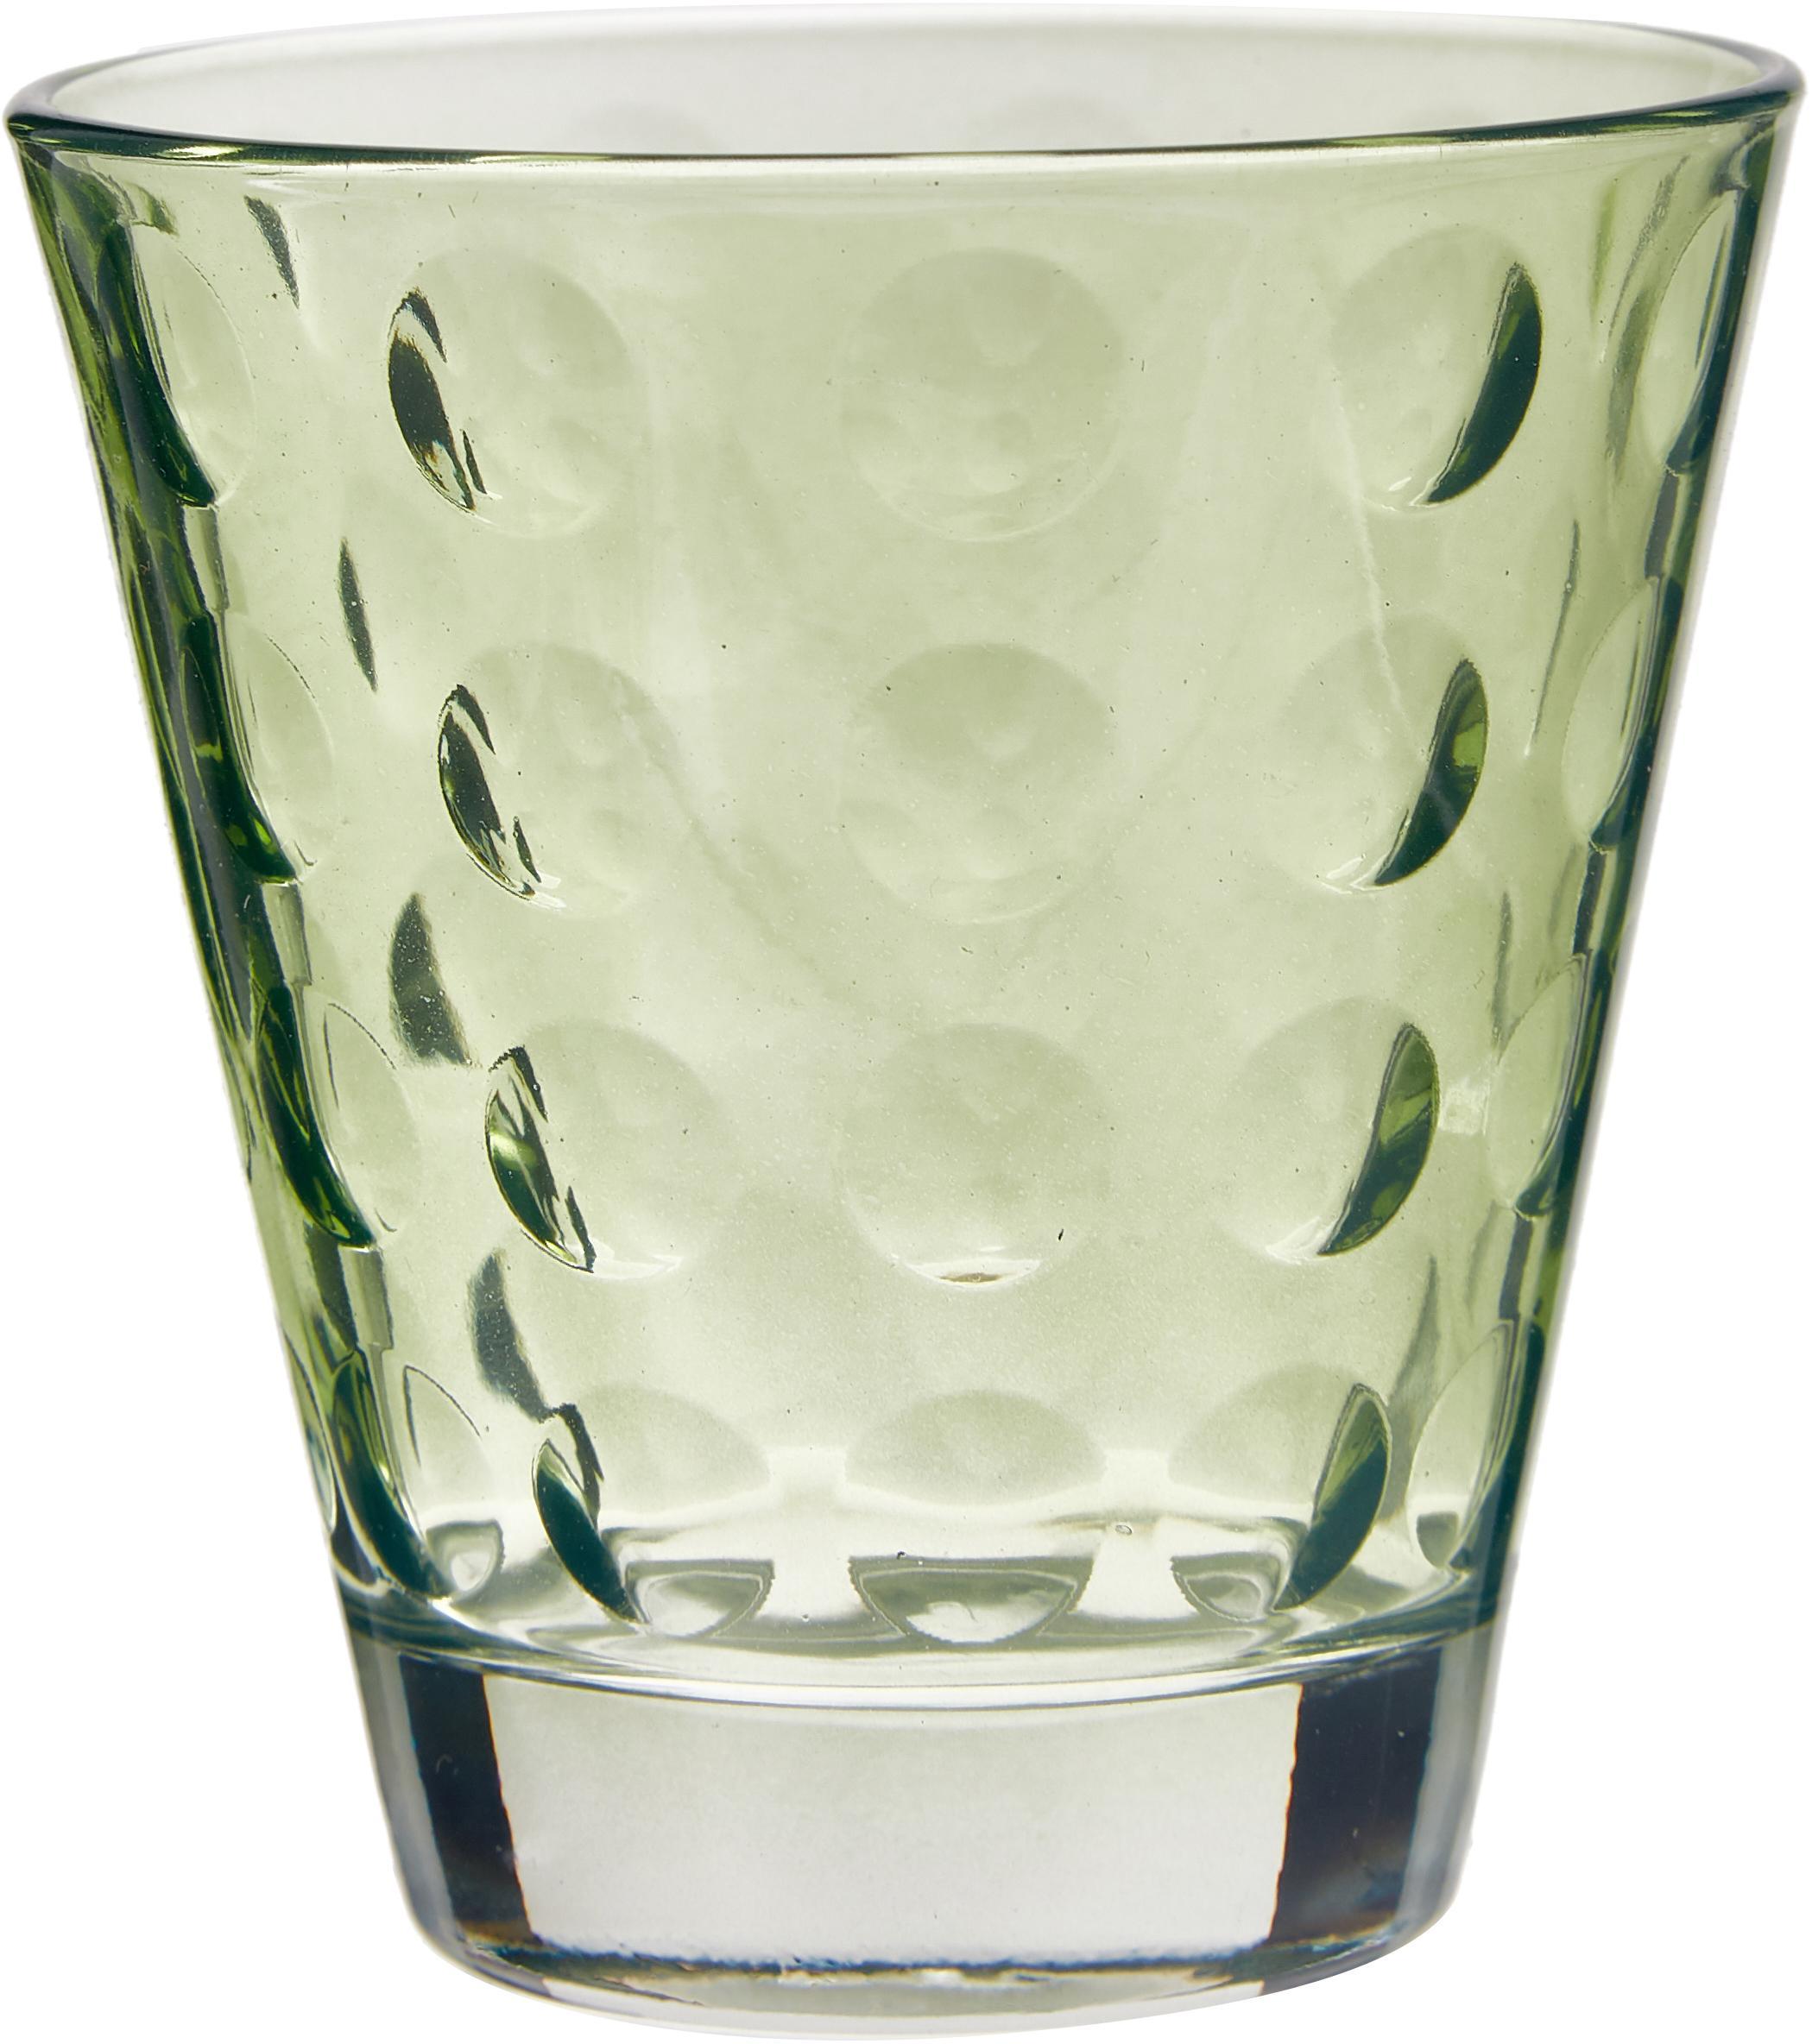 Set di 6 bicchieri acqua colorati Gunnar, Vetro, Multicolore, Ø 9 x Alt. 9 cm